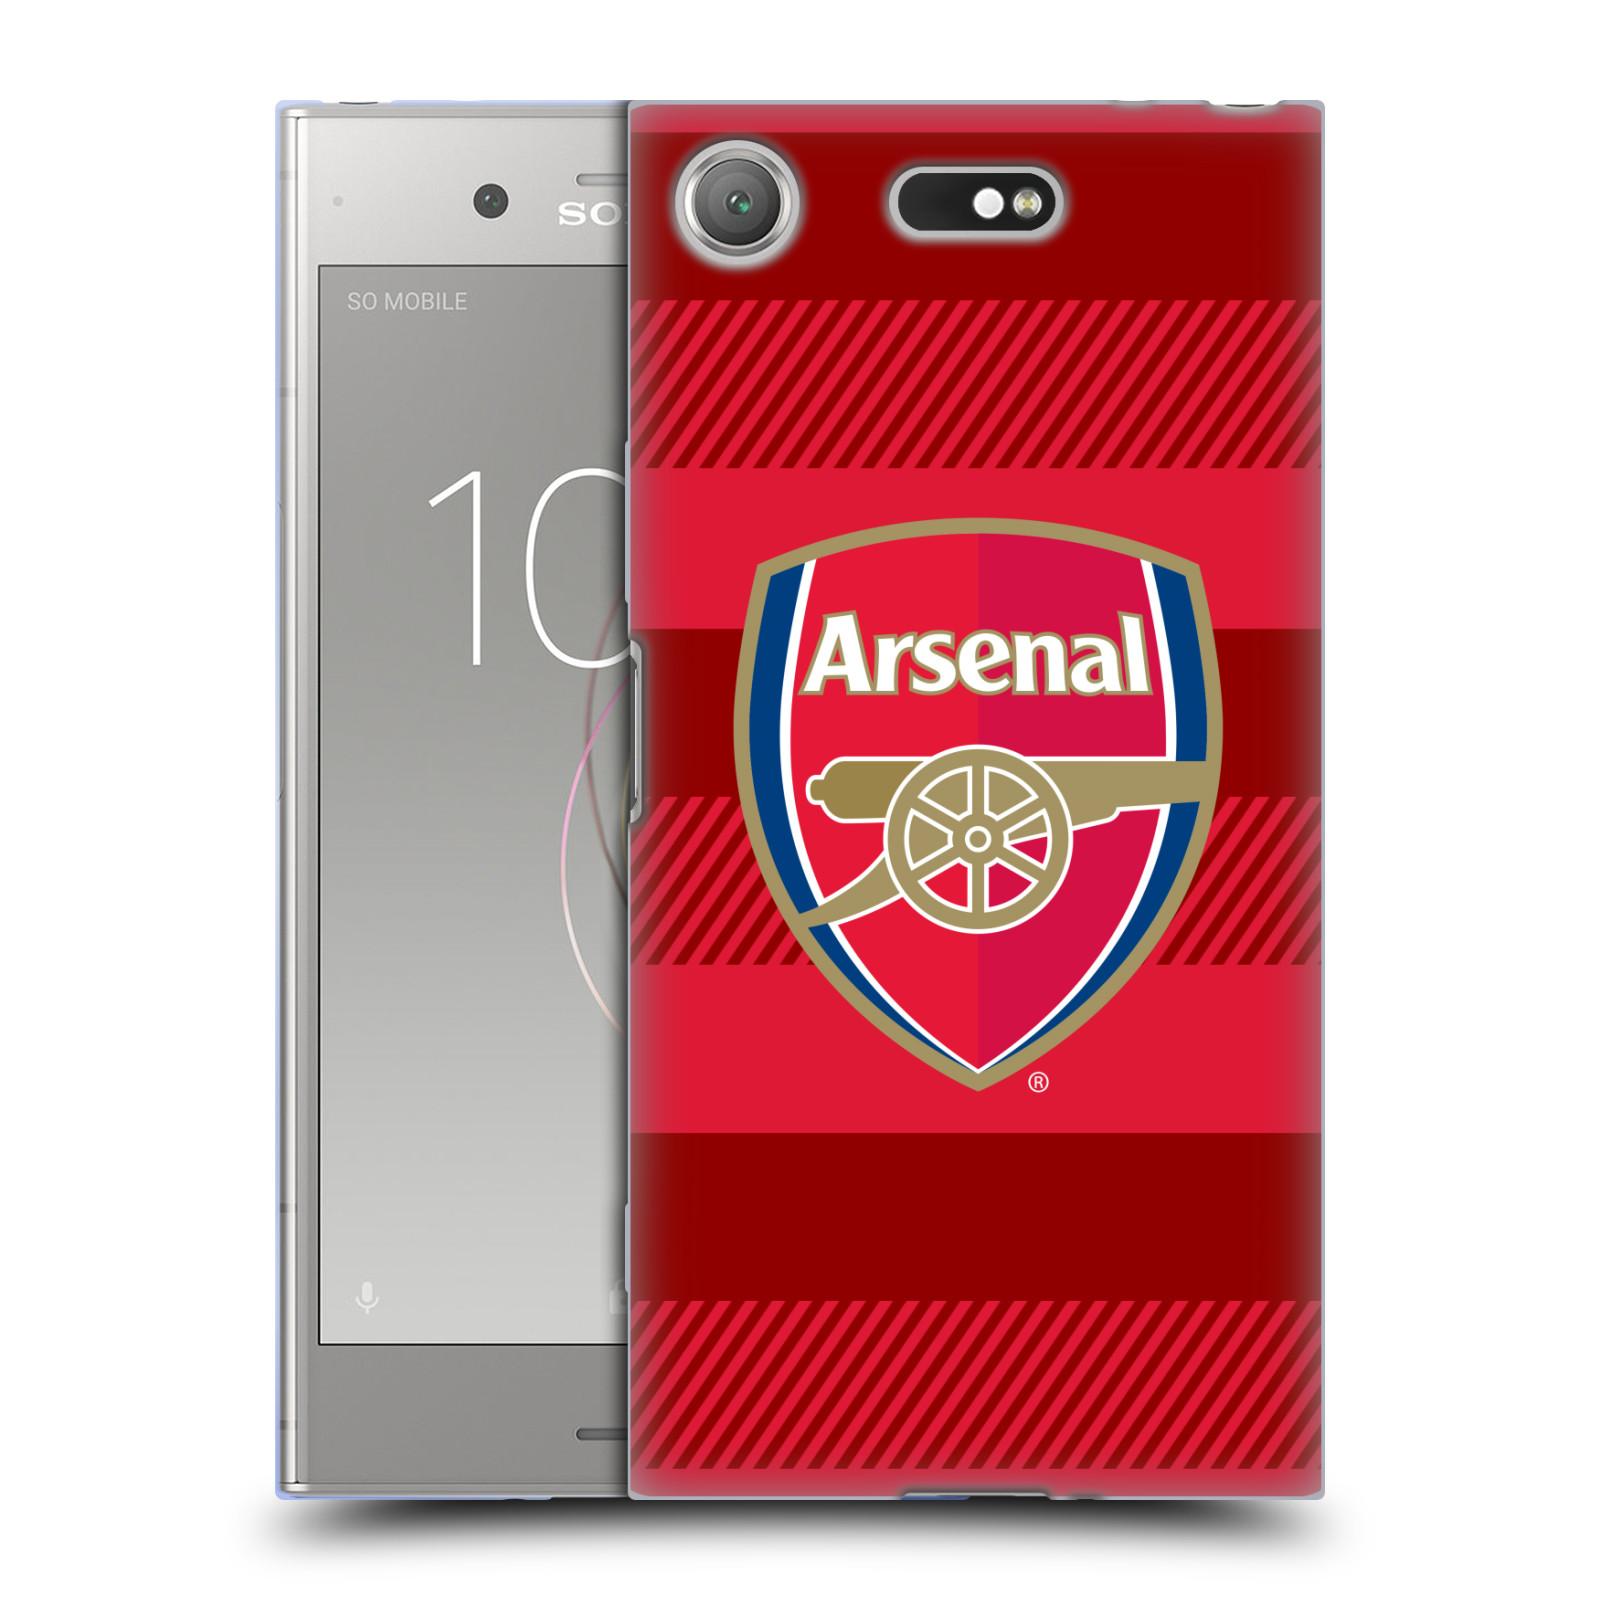 Silikonové pouzdro na mobil Sony Xperia XZ1 Compact - Head Case - Arsenal FC - Logo s pruhy